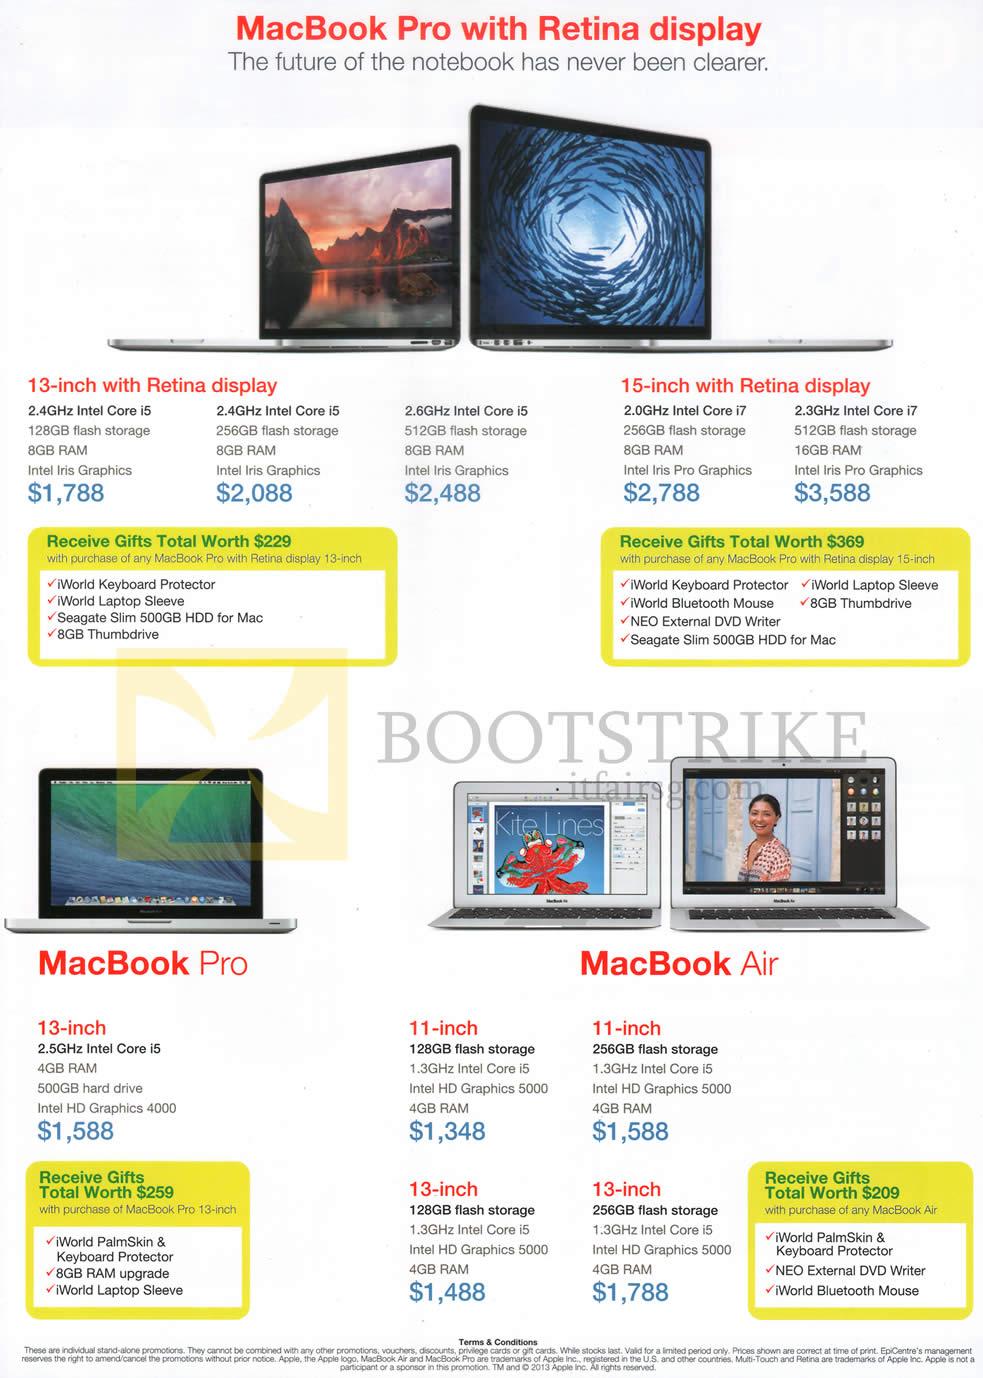 SITEX 2013 price list image brochure of Epicentre Apple MacBook Pro, Apple MacBook Air, Retina Display